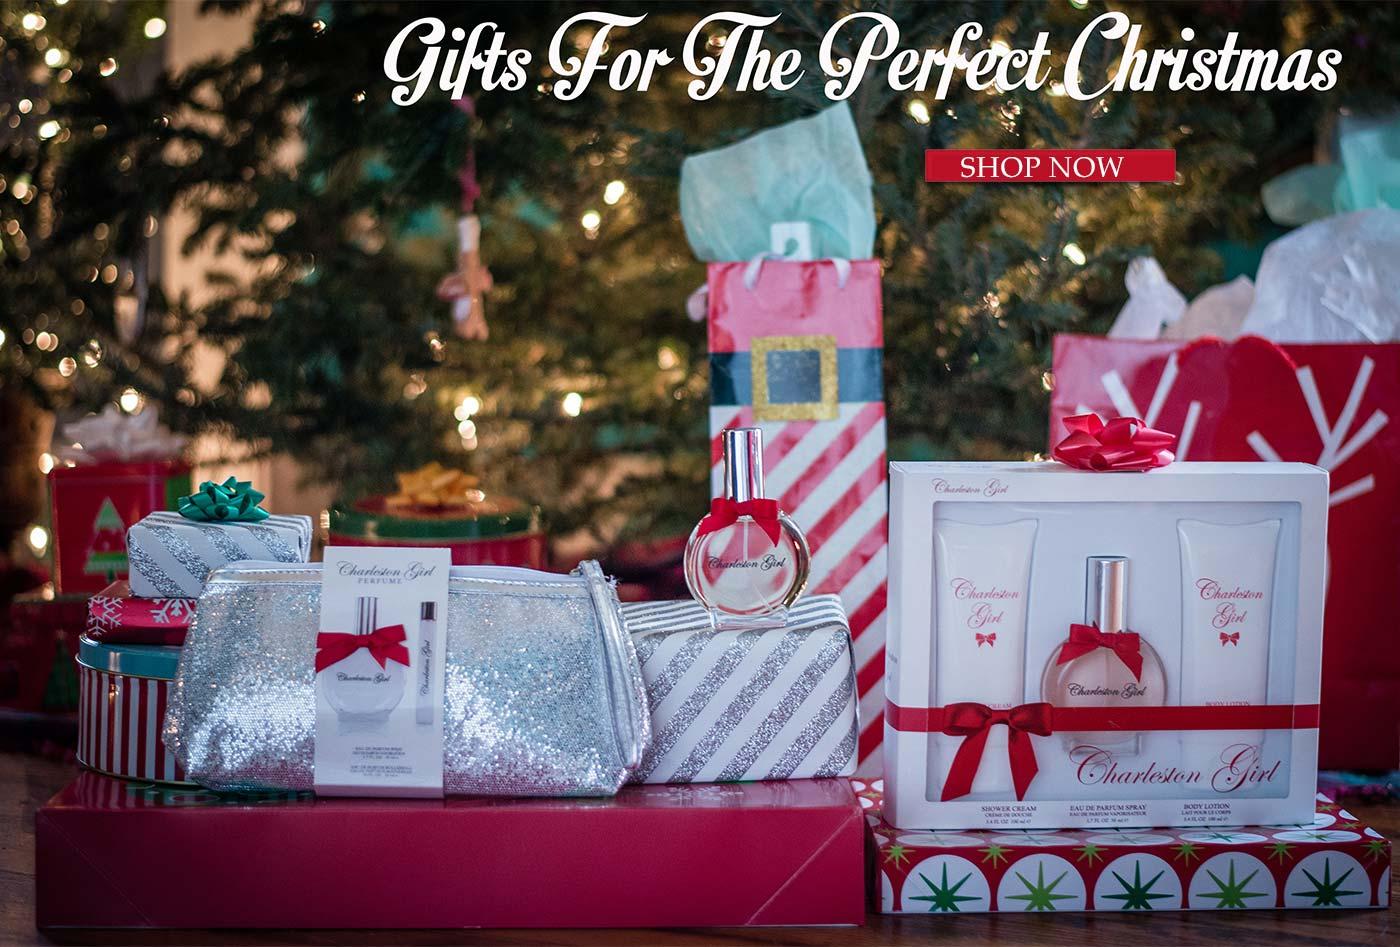 Christmas Gift Ideas Charleston Girl Perfume Specials